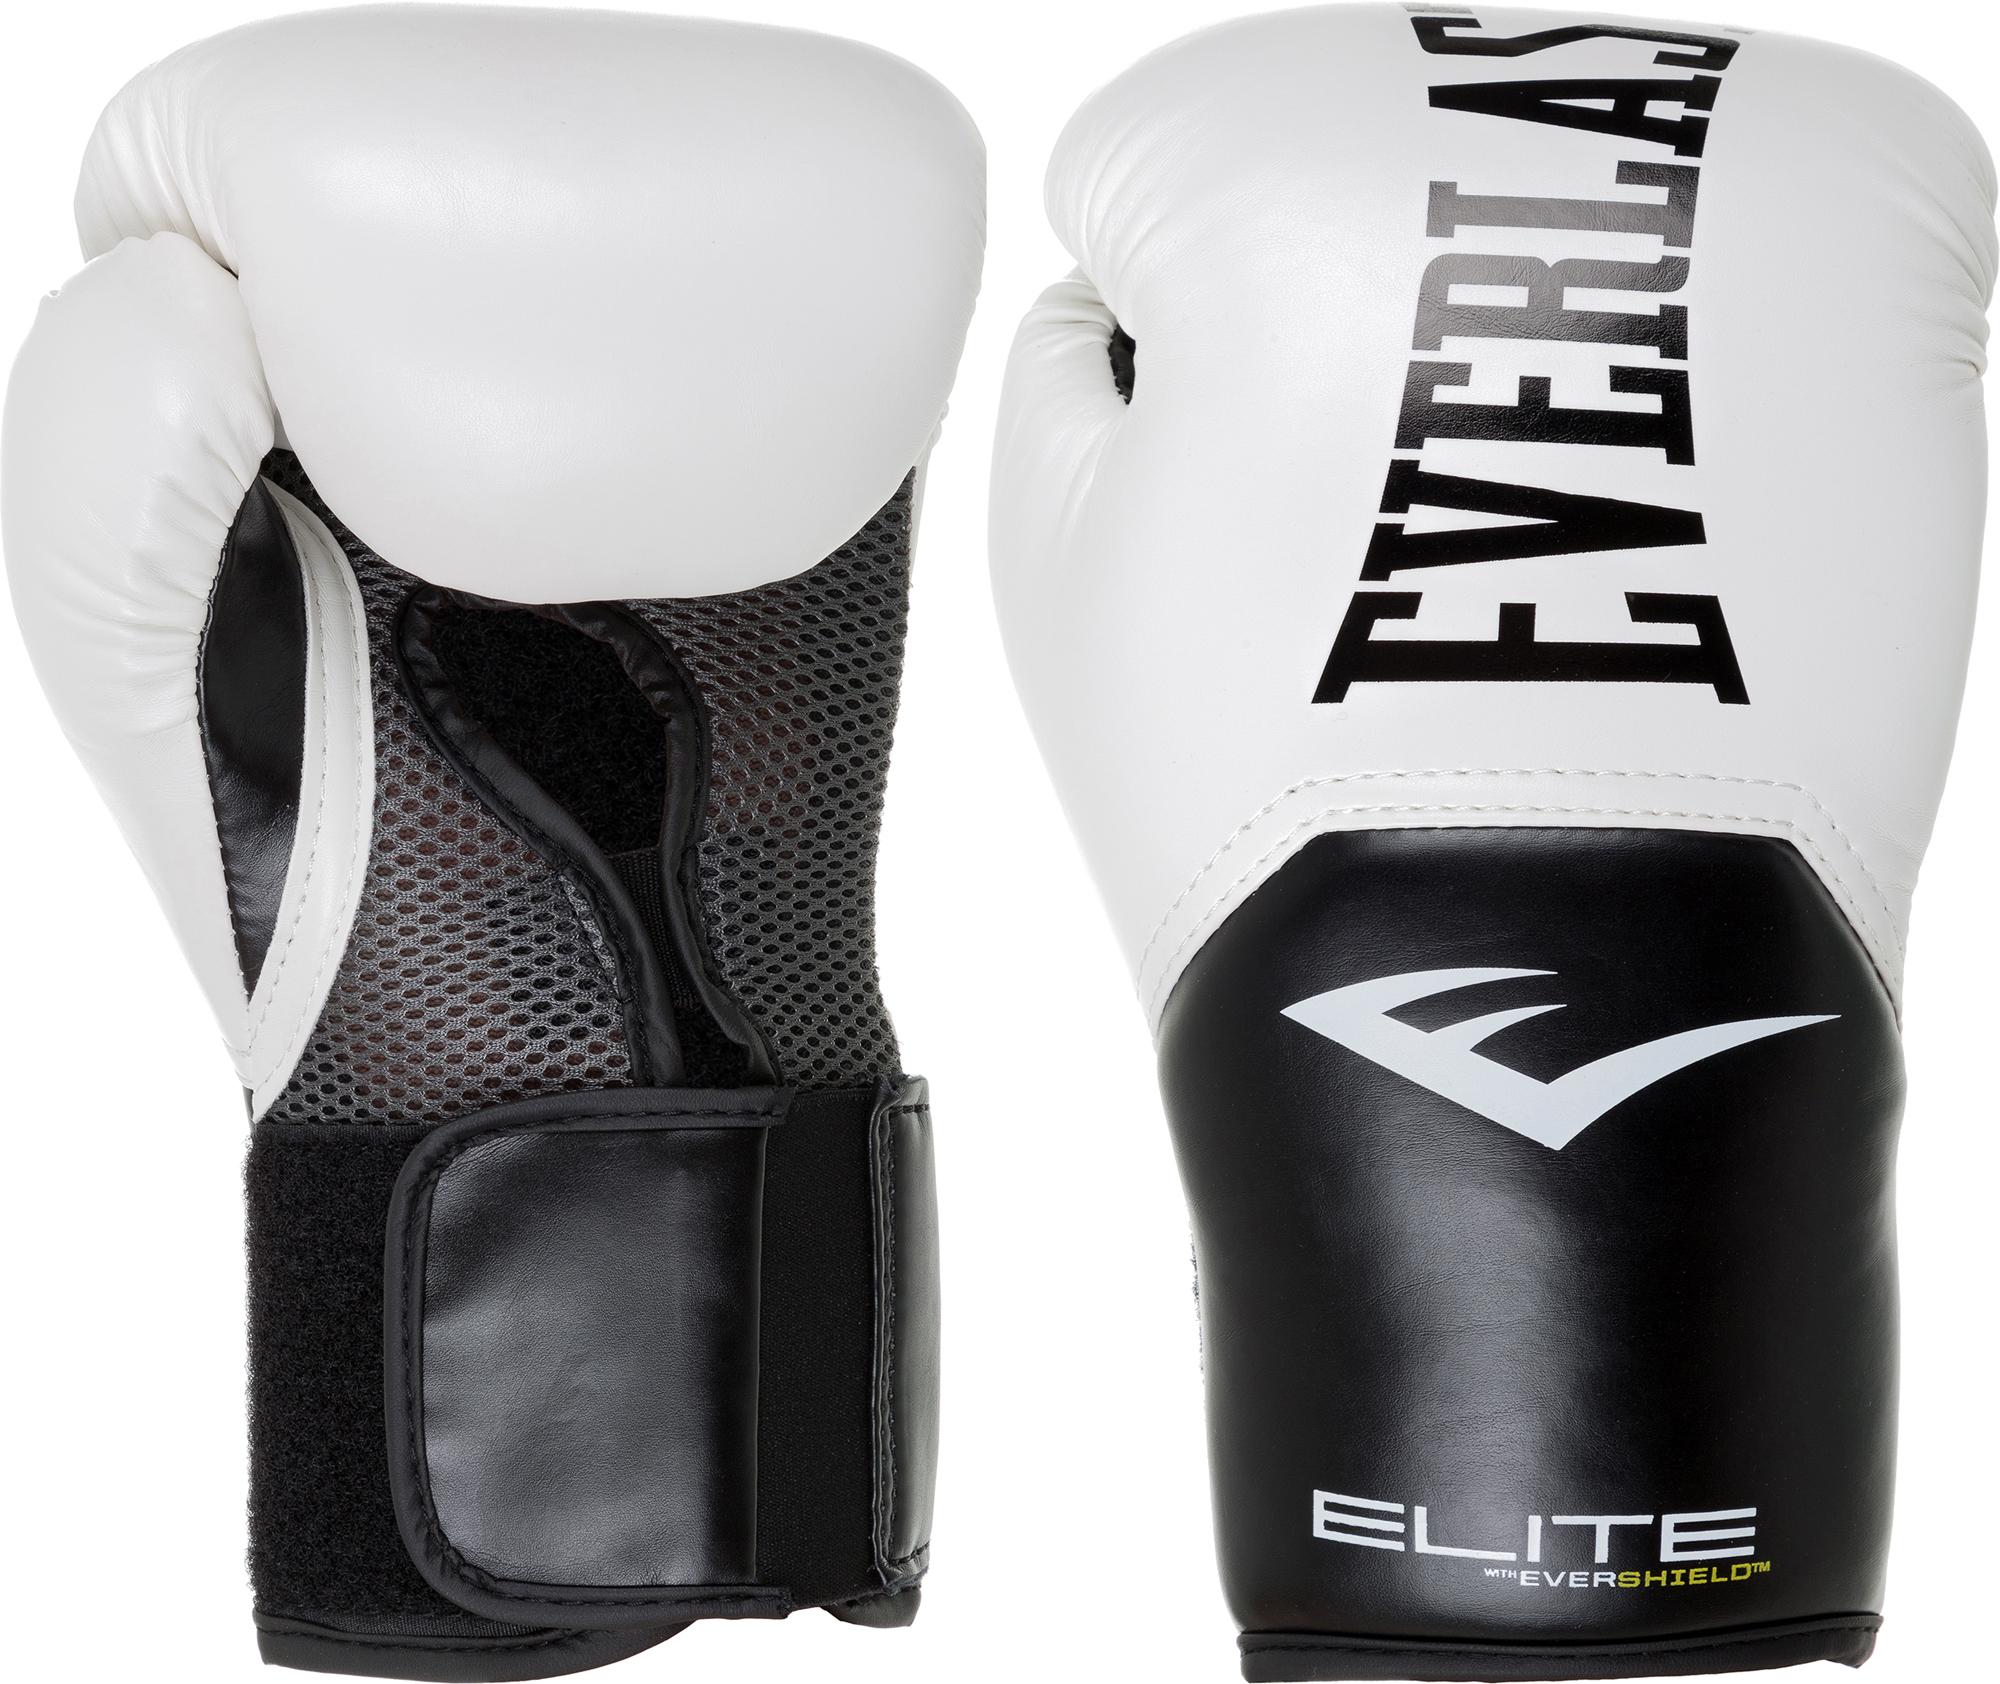 цены на Everlast Перчатки боксерские Everlast, размер 14 oz